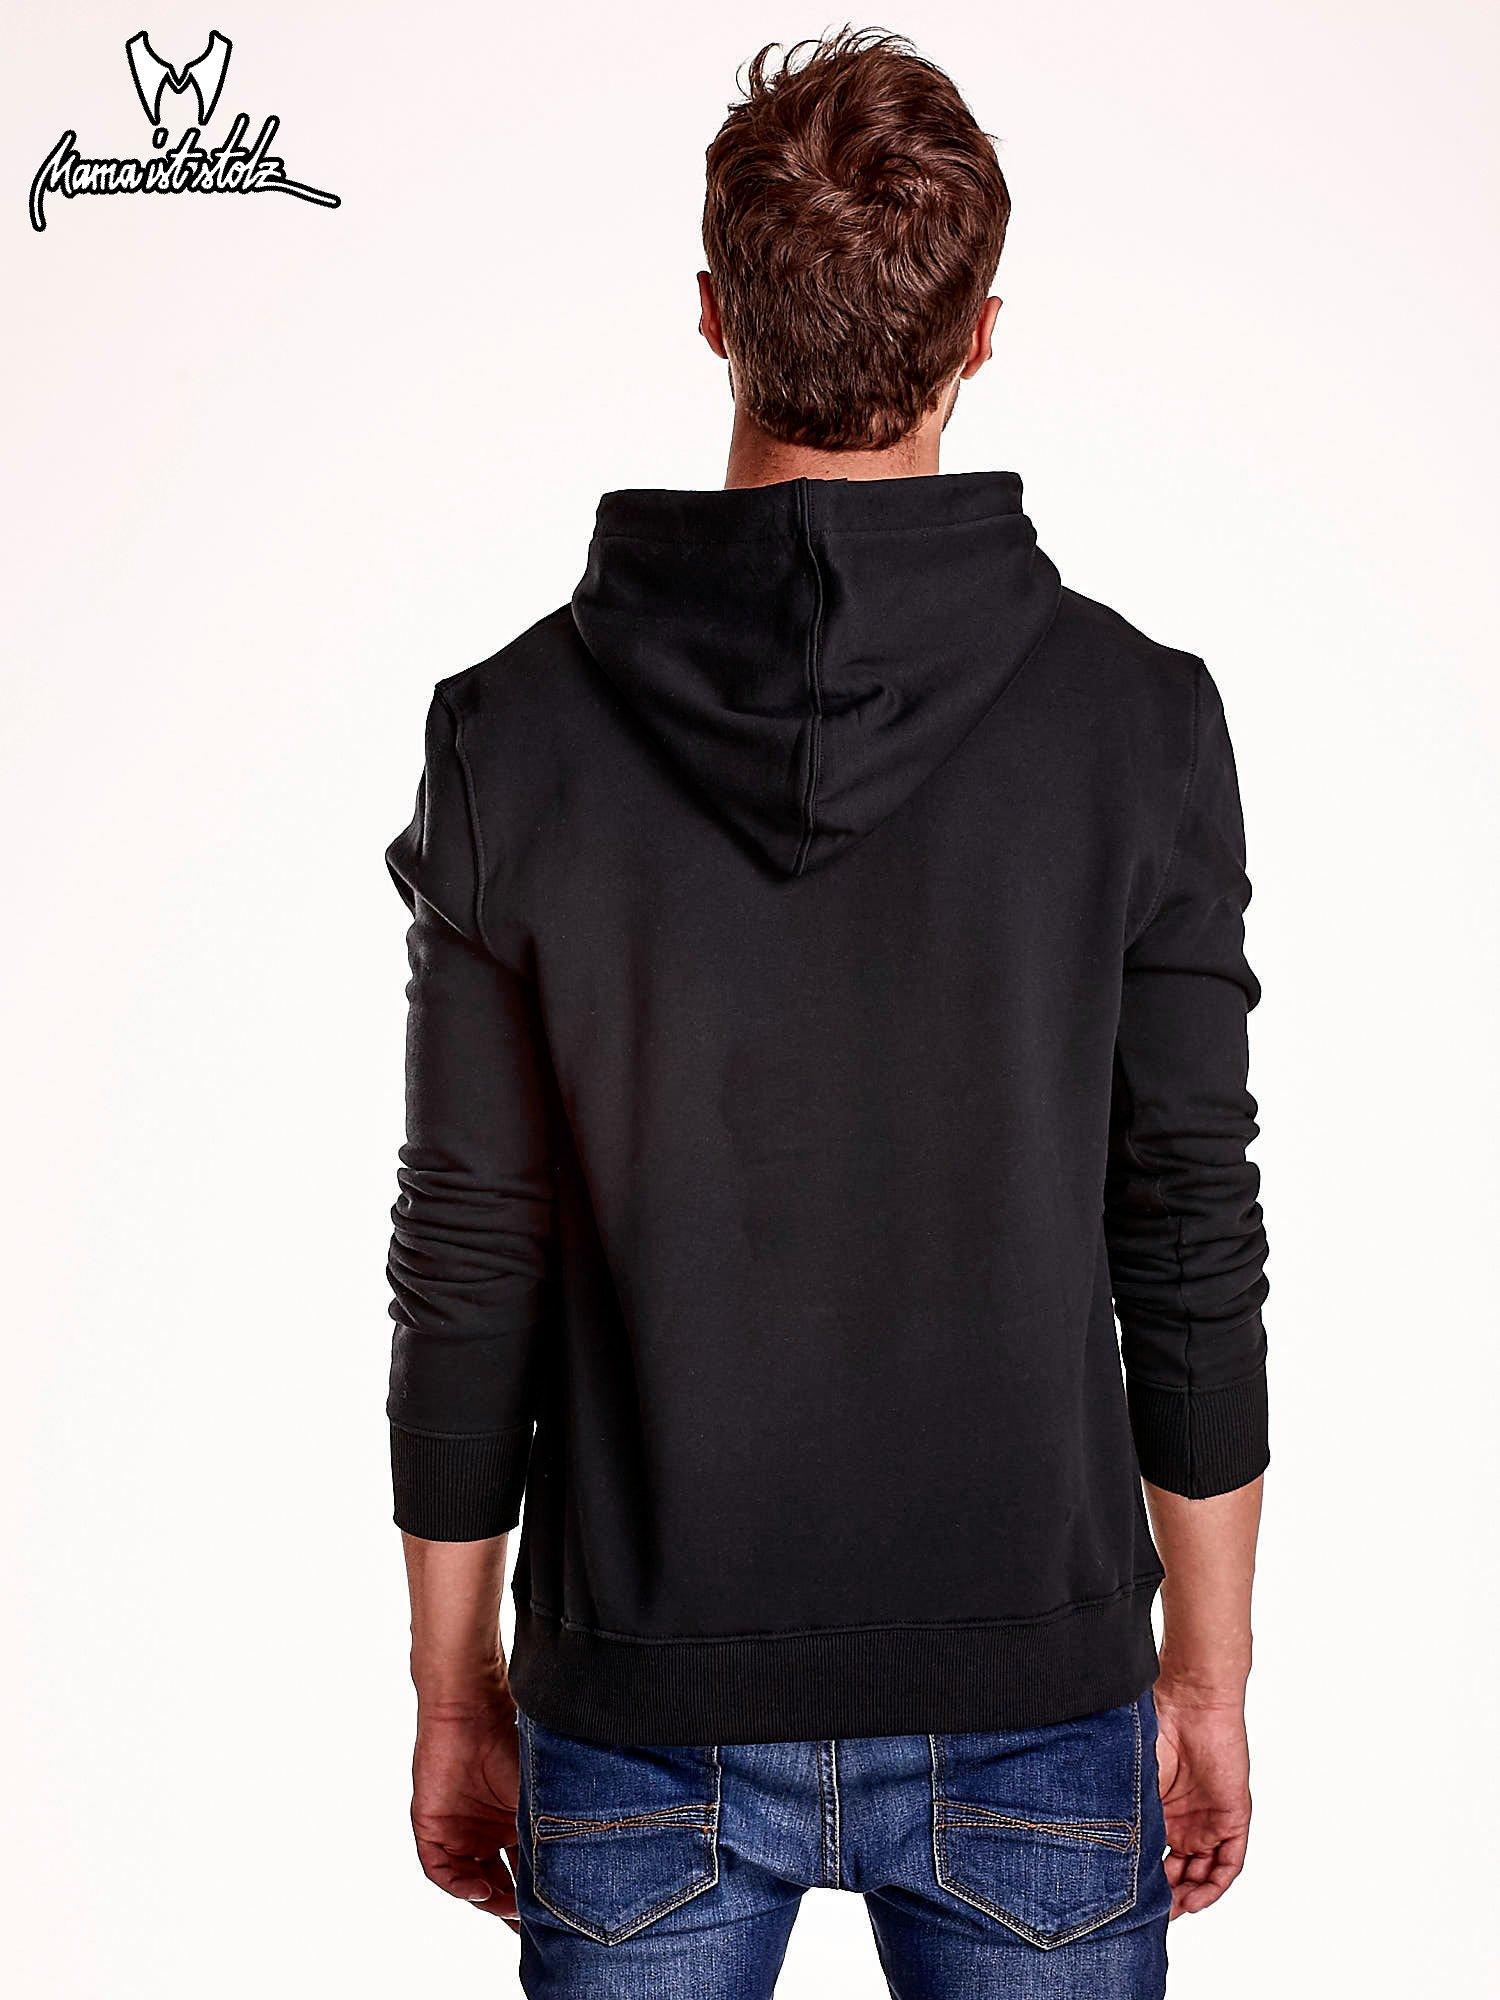 Bluza męska z kapturem i naszywkami czarna